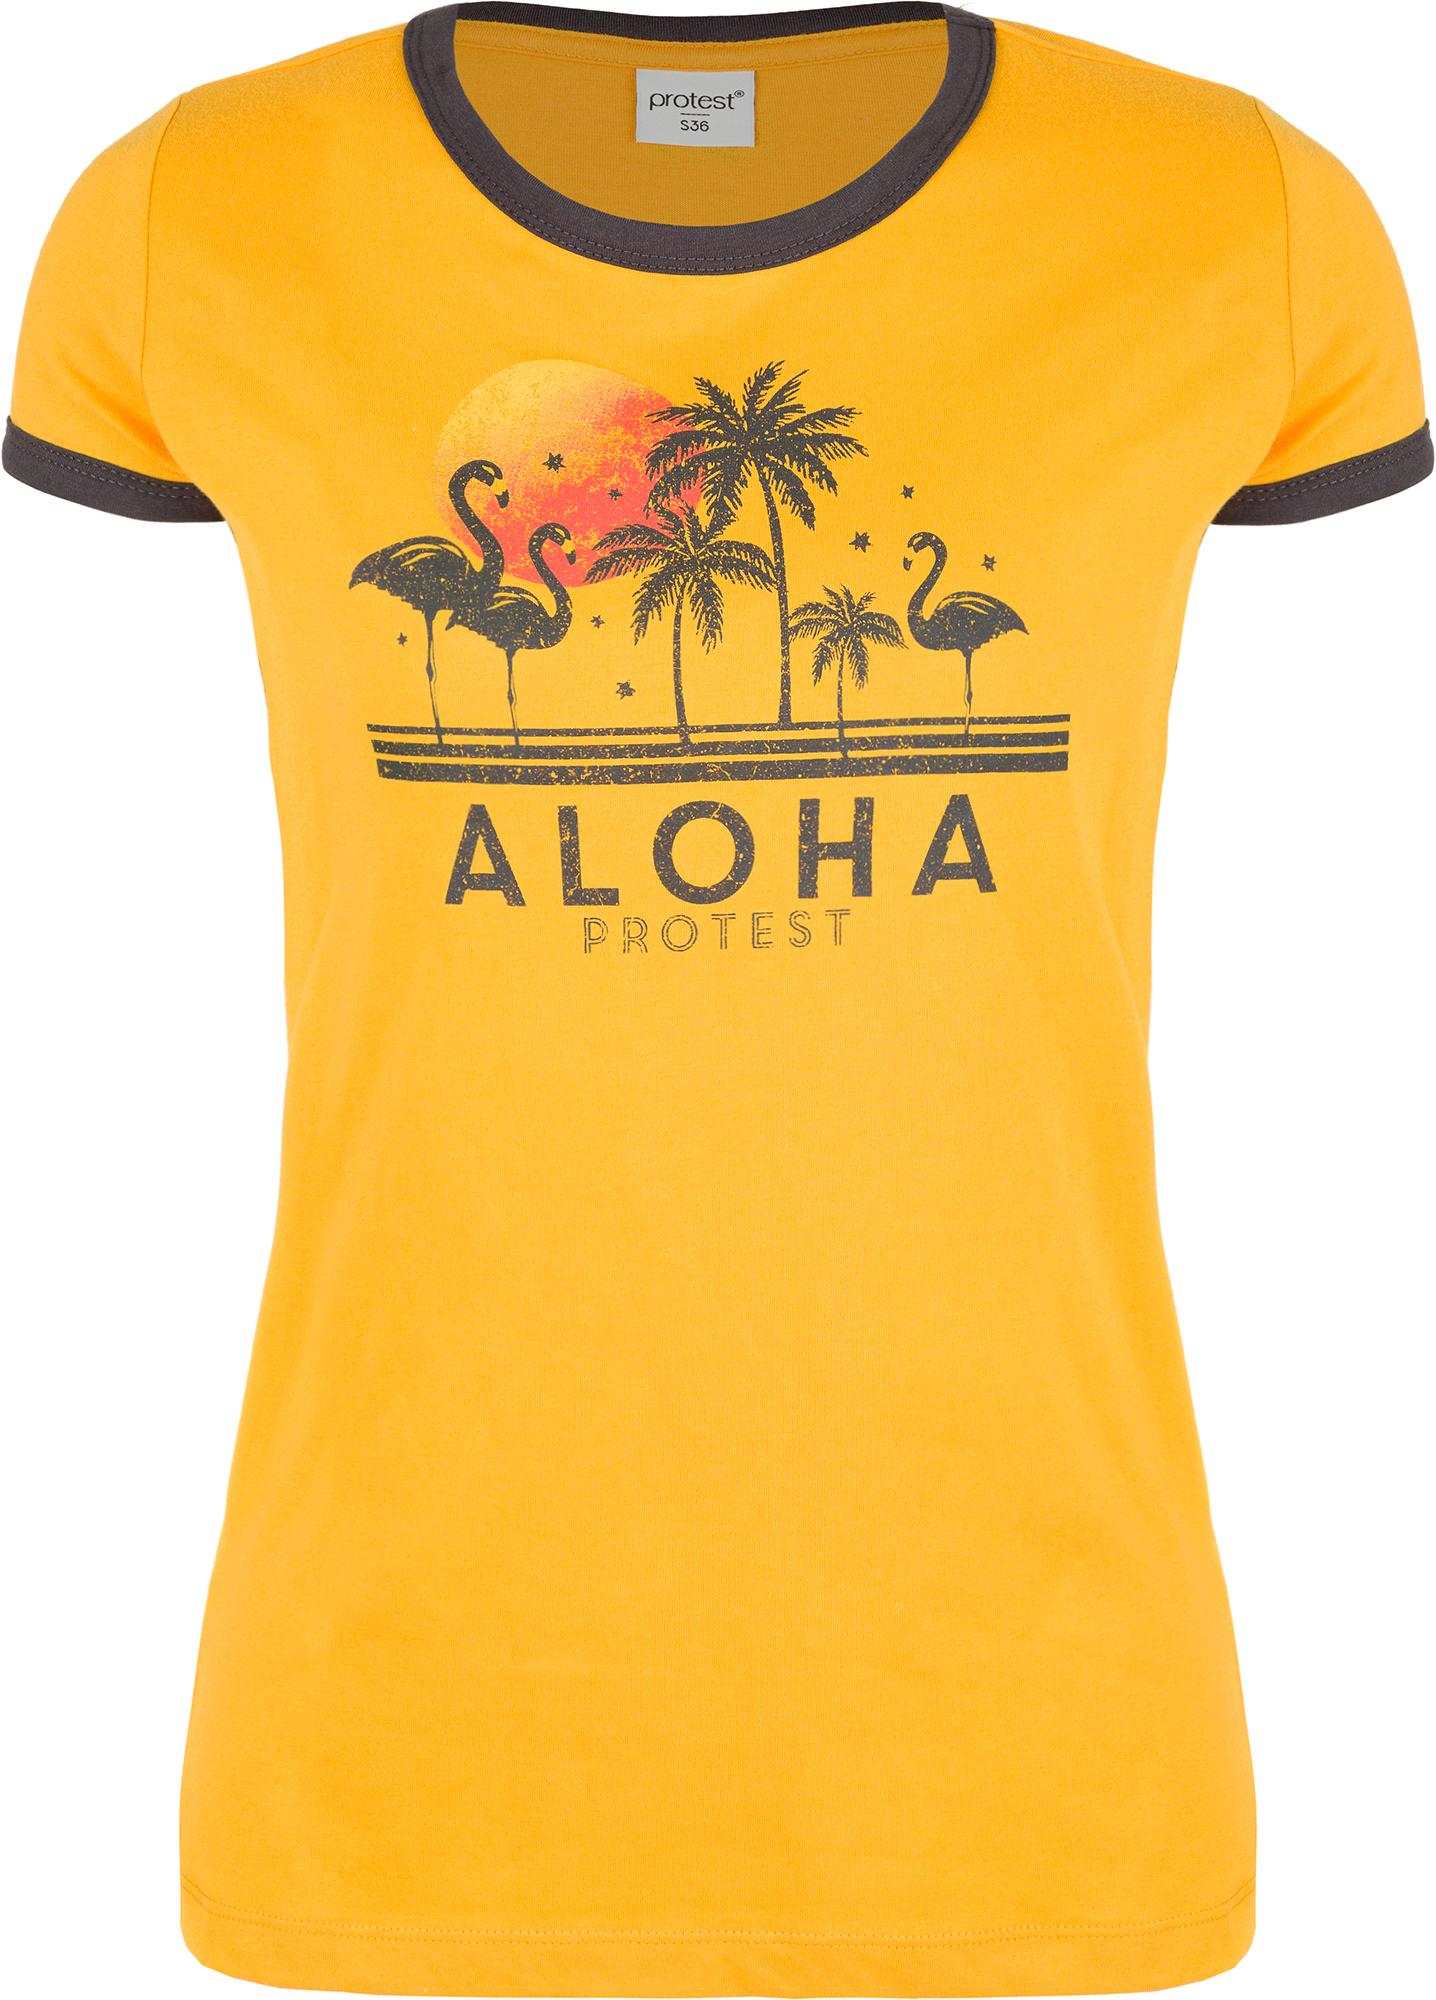 Protest Футболка женская Aloha, размер 50